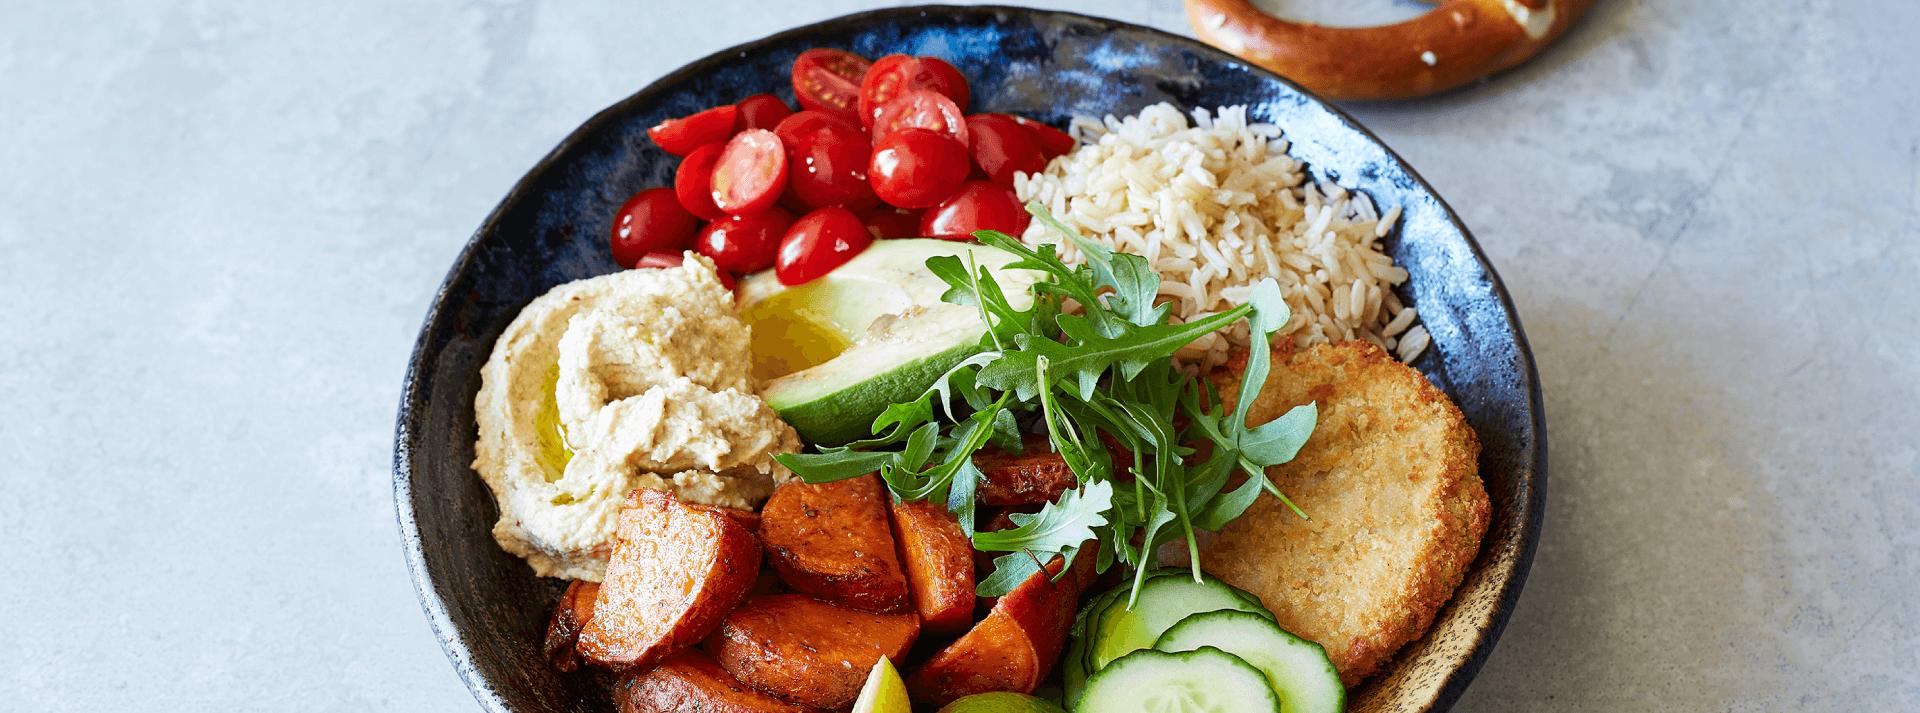 Buddha Bowl with Chicken-Style Burgers & Hummus 2019